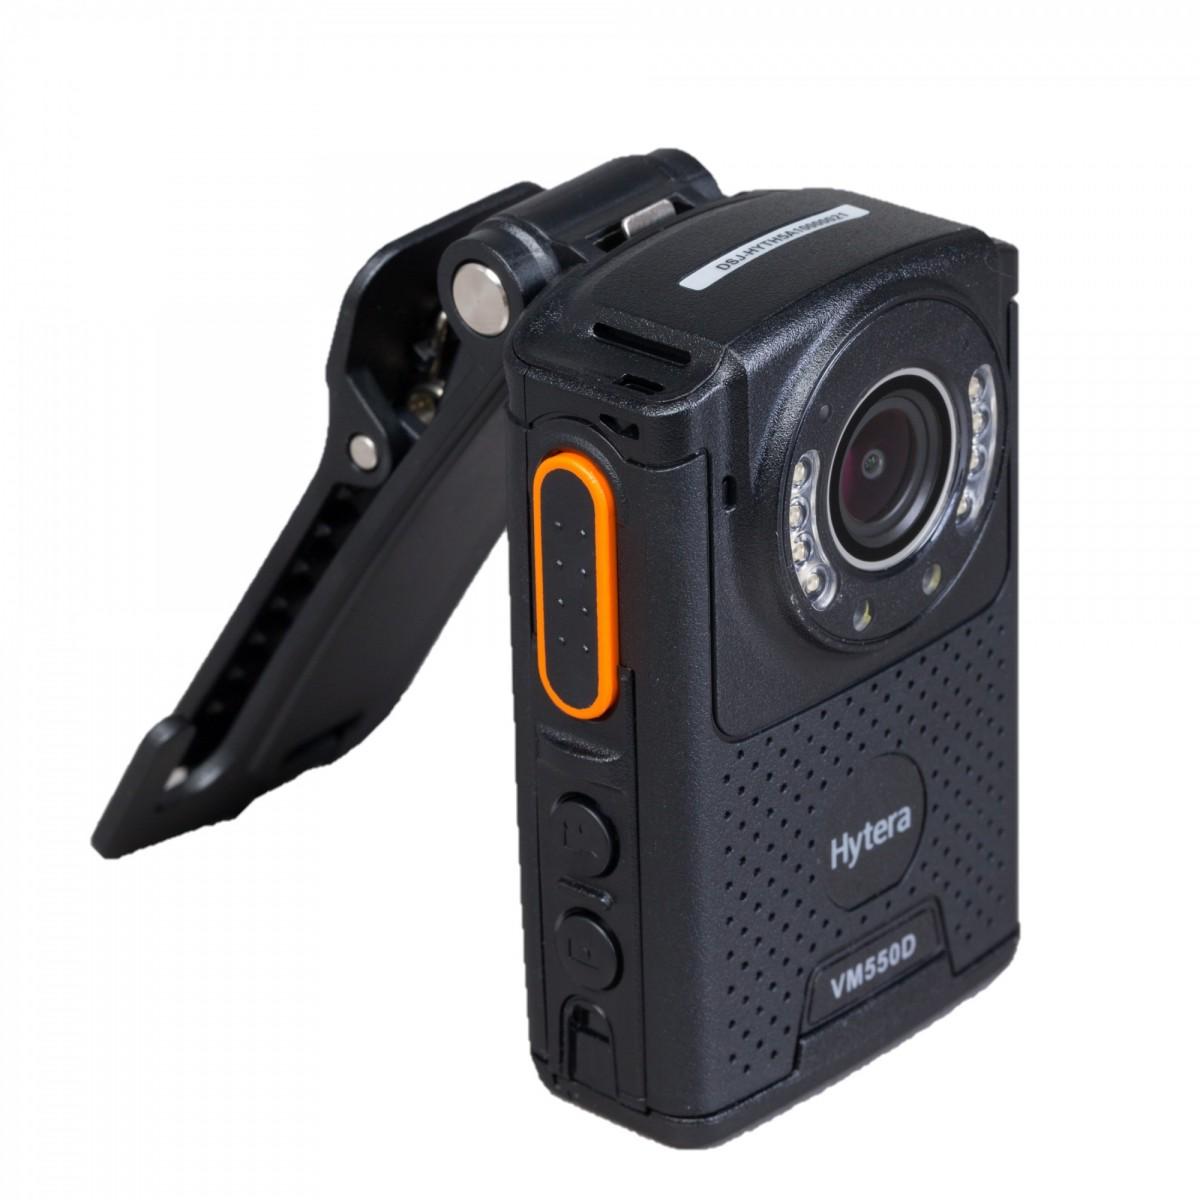 Видеорегистратор Hytera VM550D